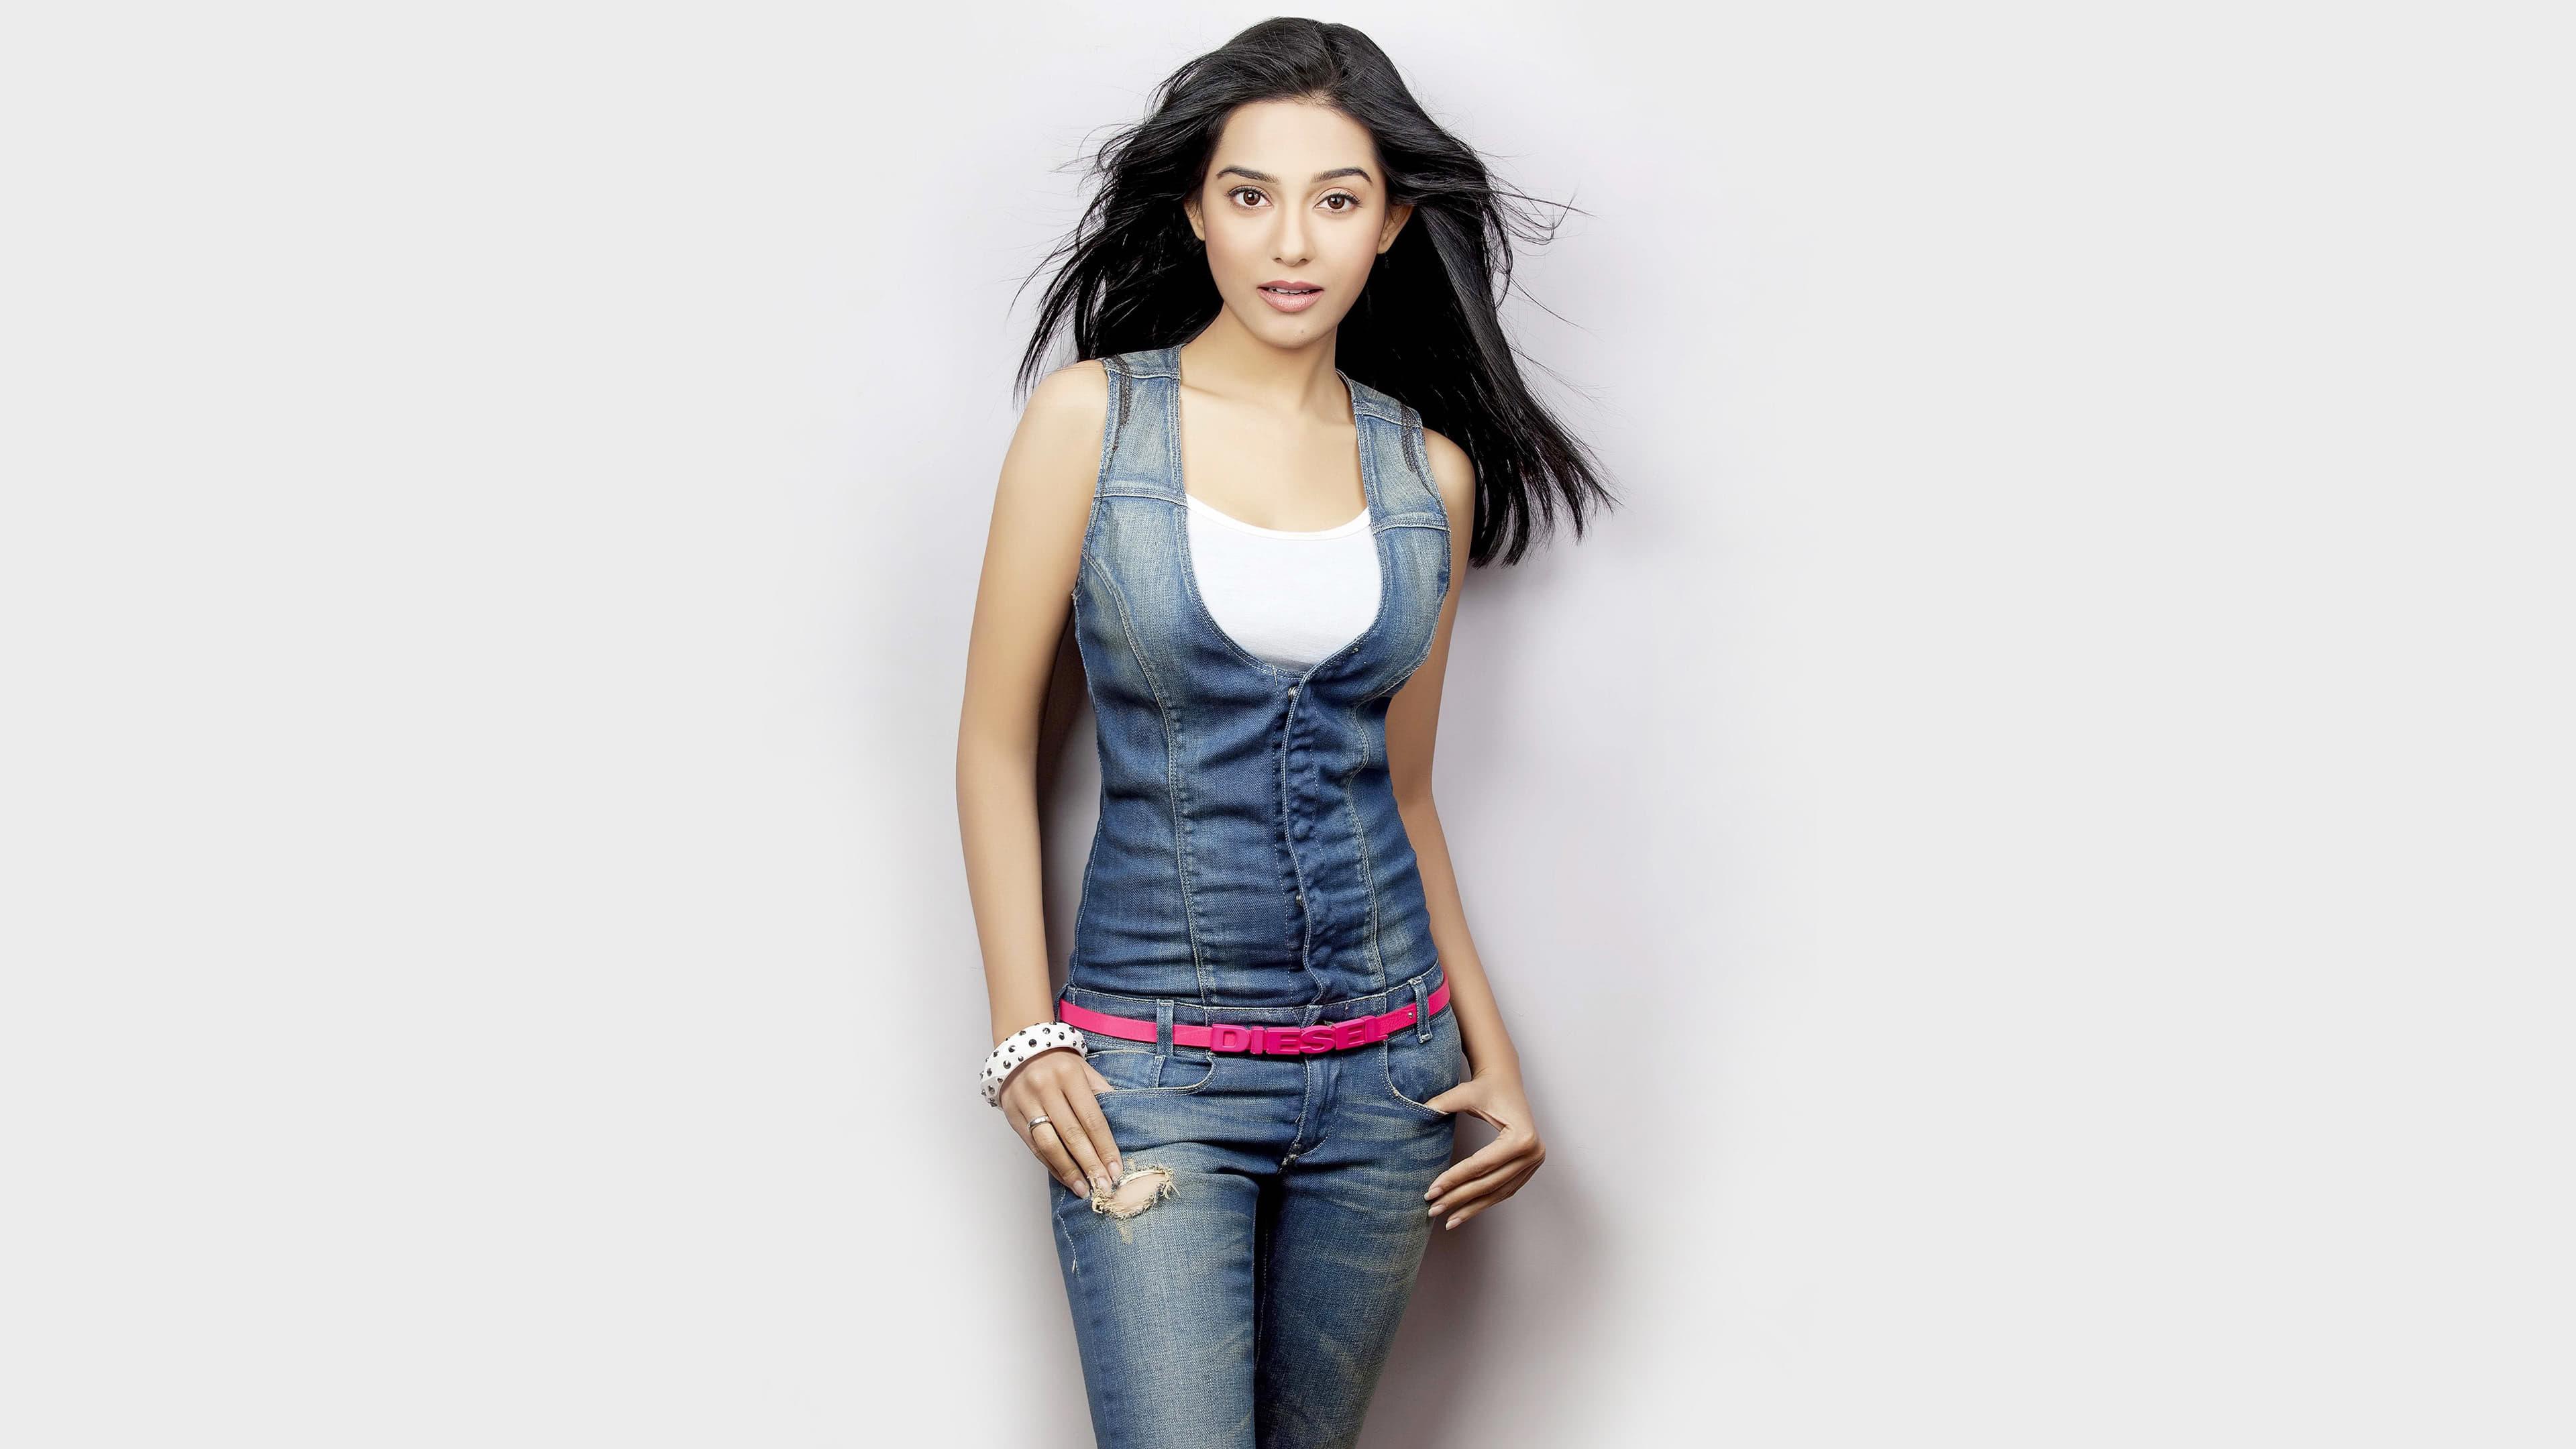 Amrita Rao Photoshoot Uhd 4k Wallpaper - Beautiful Figure Of Indian Girl , HD Wallpaper & Backgrounds